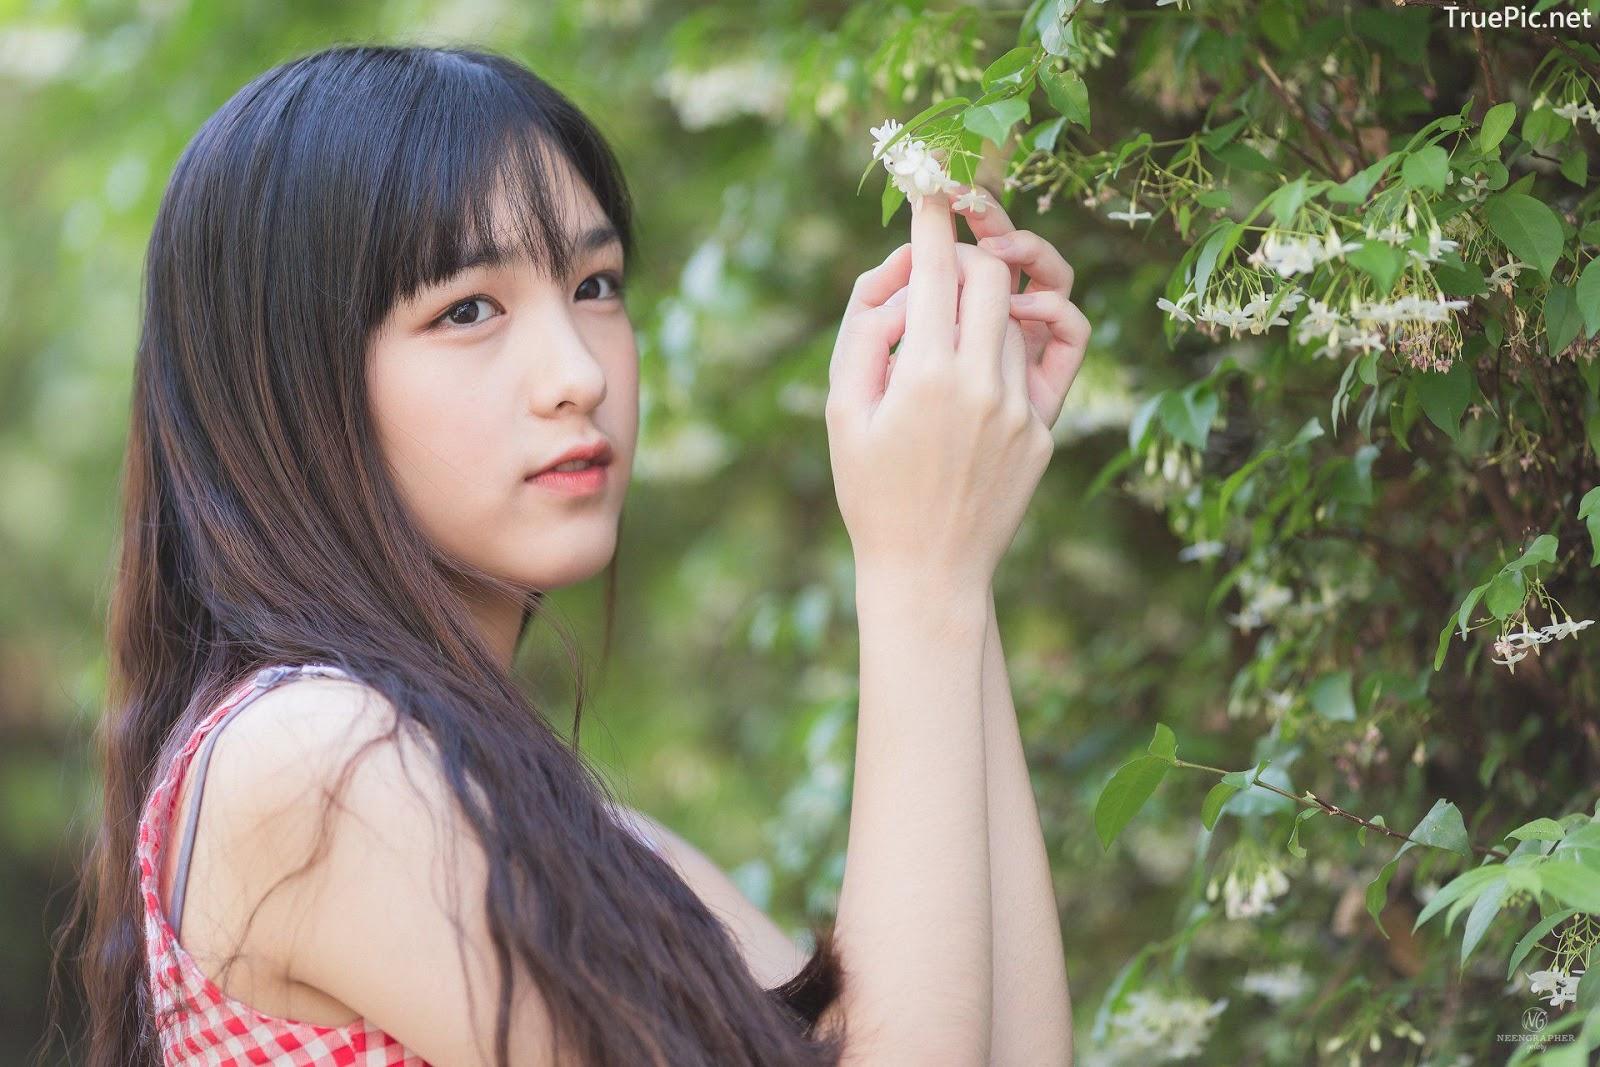 Image-Thailand-Cute-Model-Emma-Panisara–Album-Emma-Bright-Sunday-TruePic.net- Picture-6